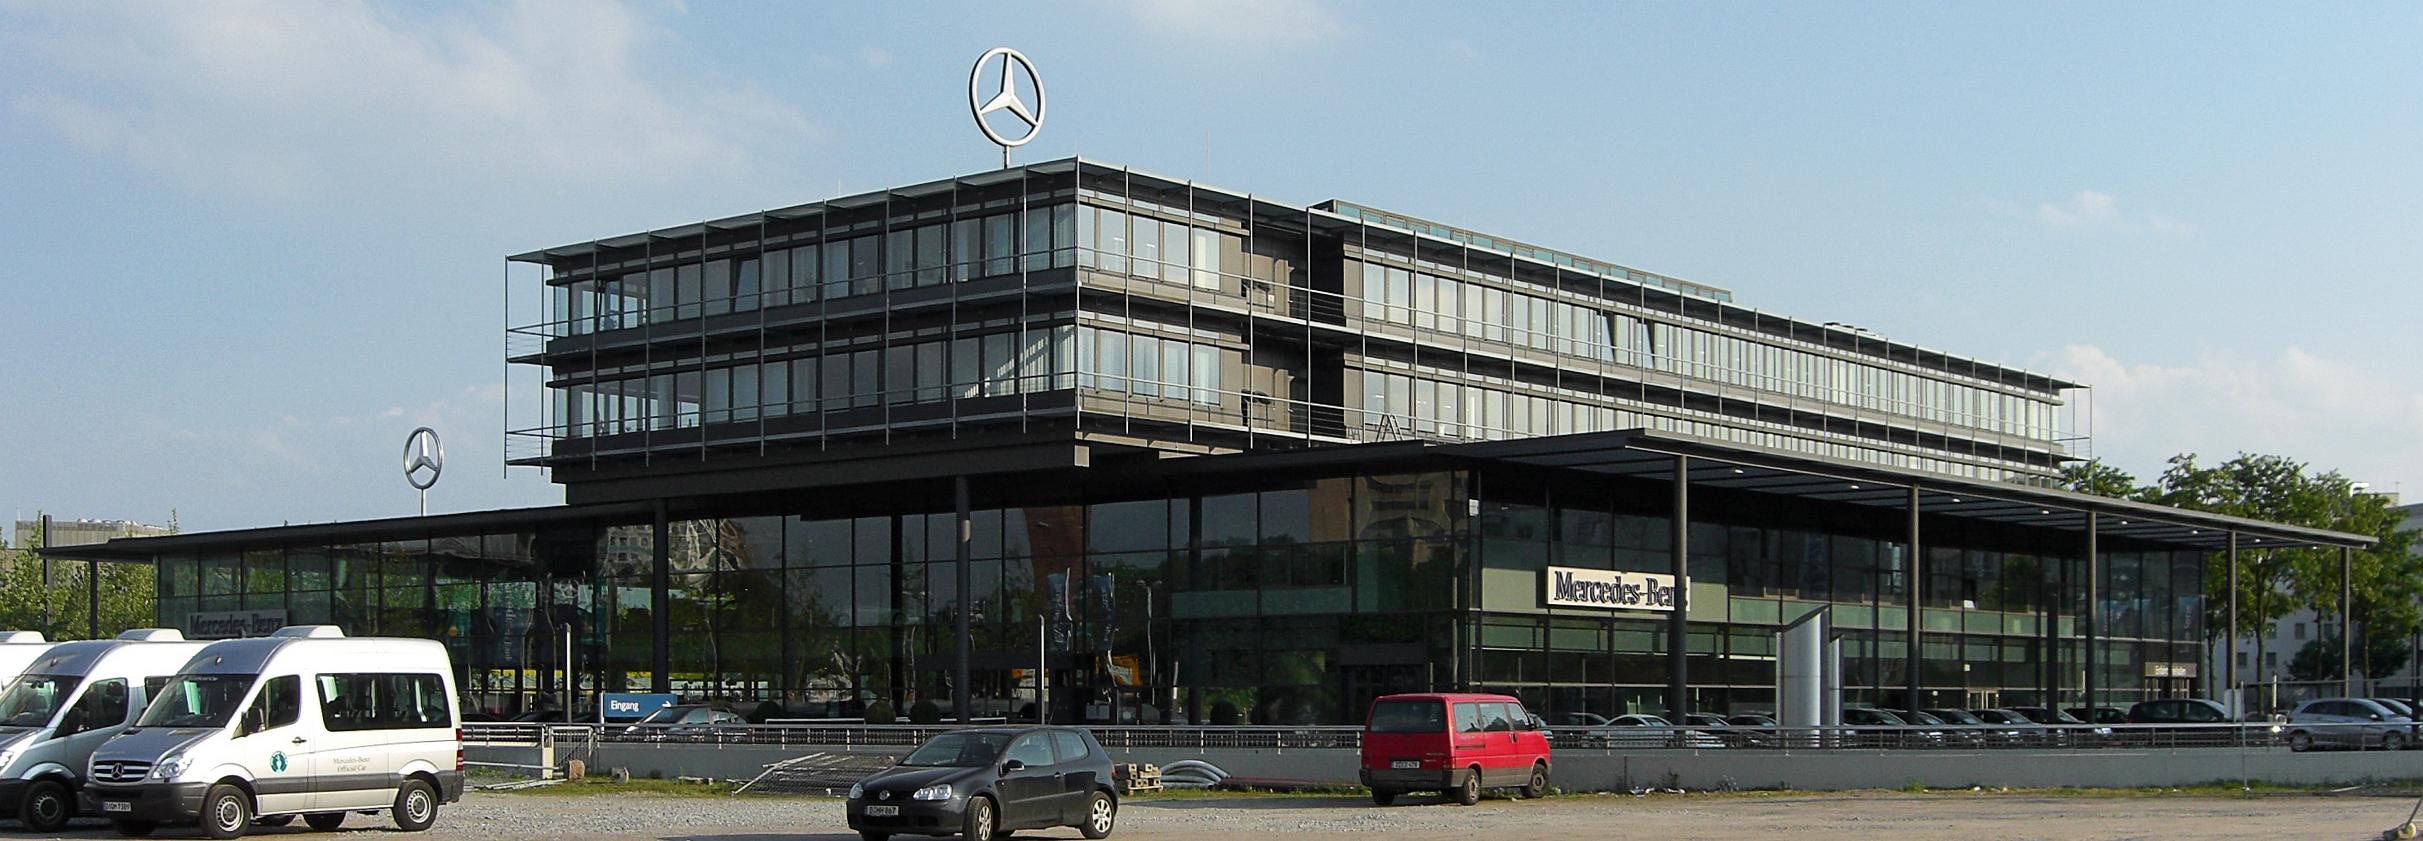 Mercedes Benz Niederlassung D Ef Bf Bdsseldorf Mercedesstra Ef Bf Bde